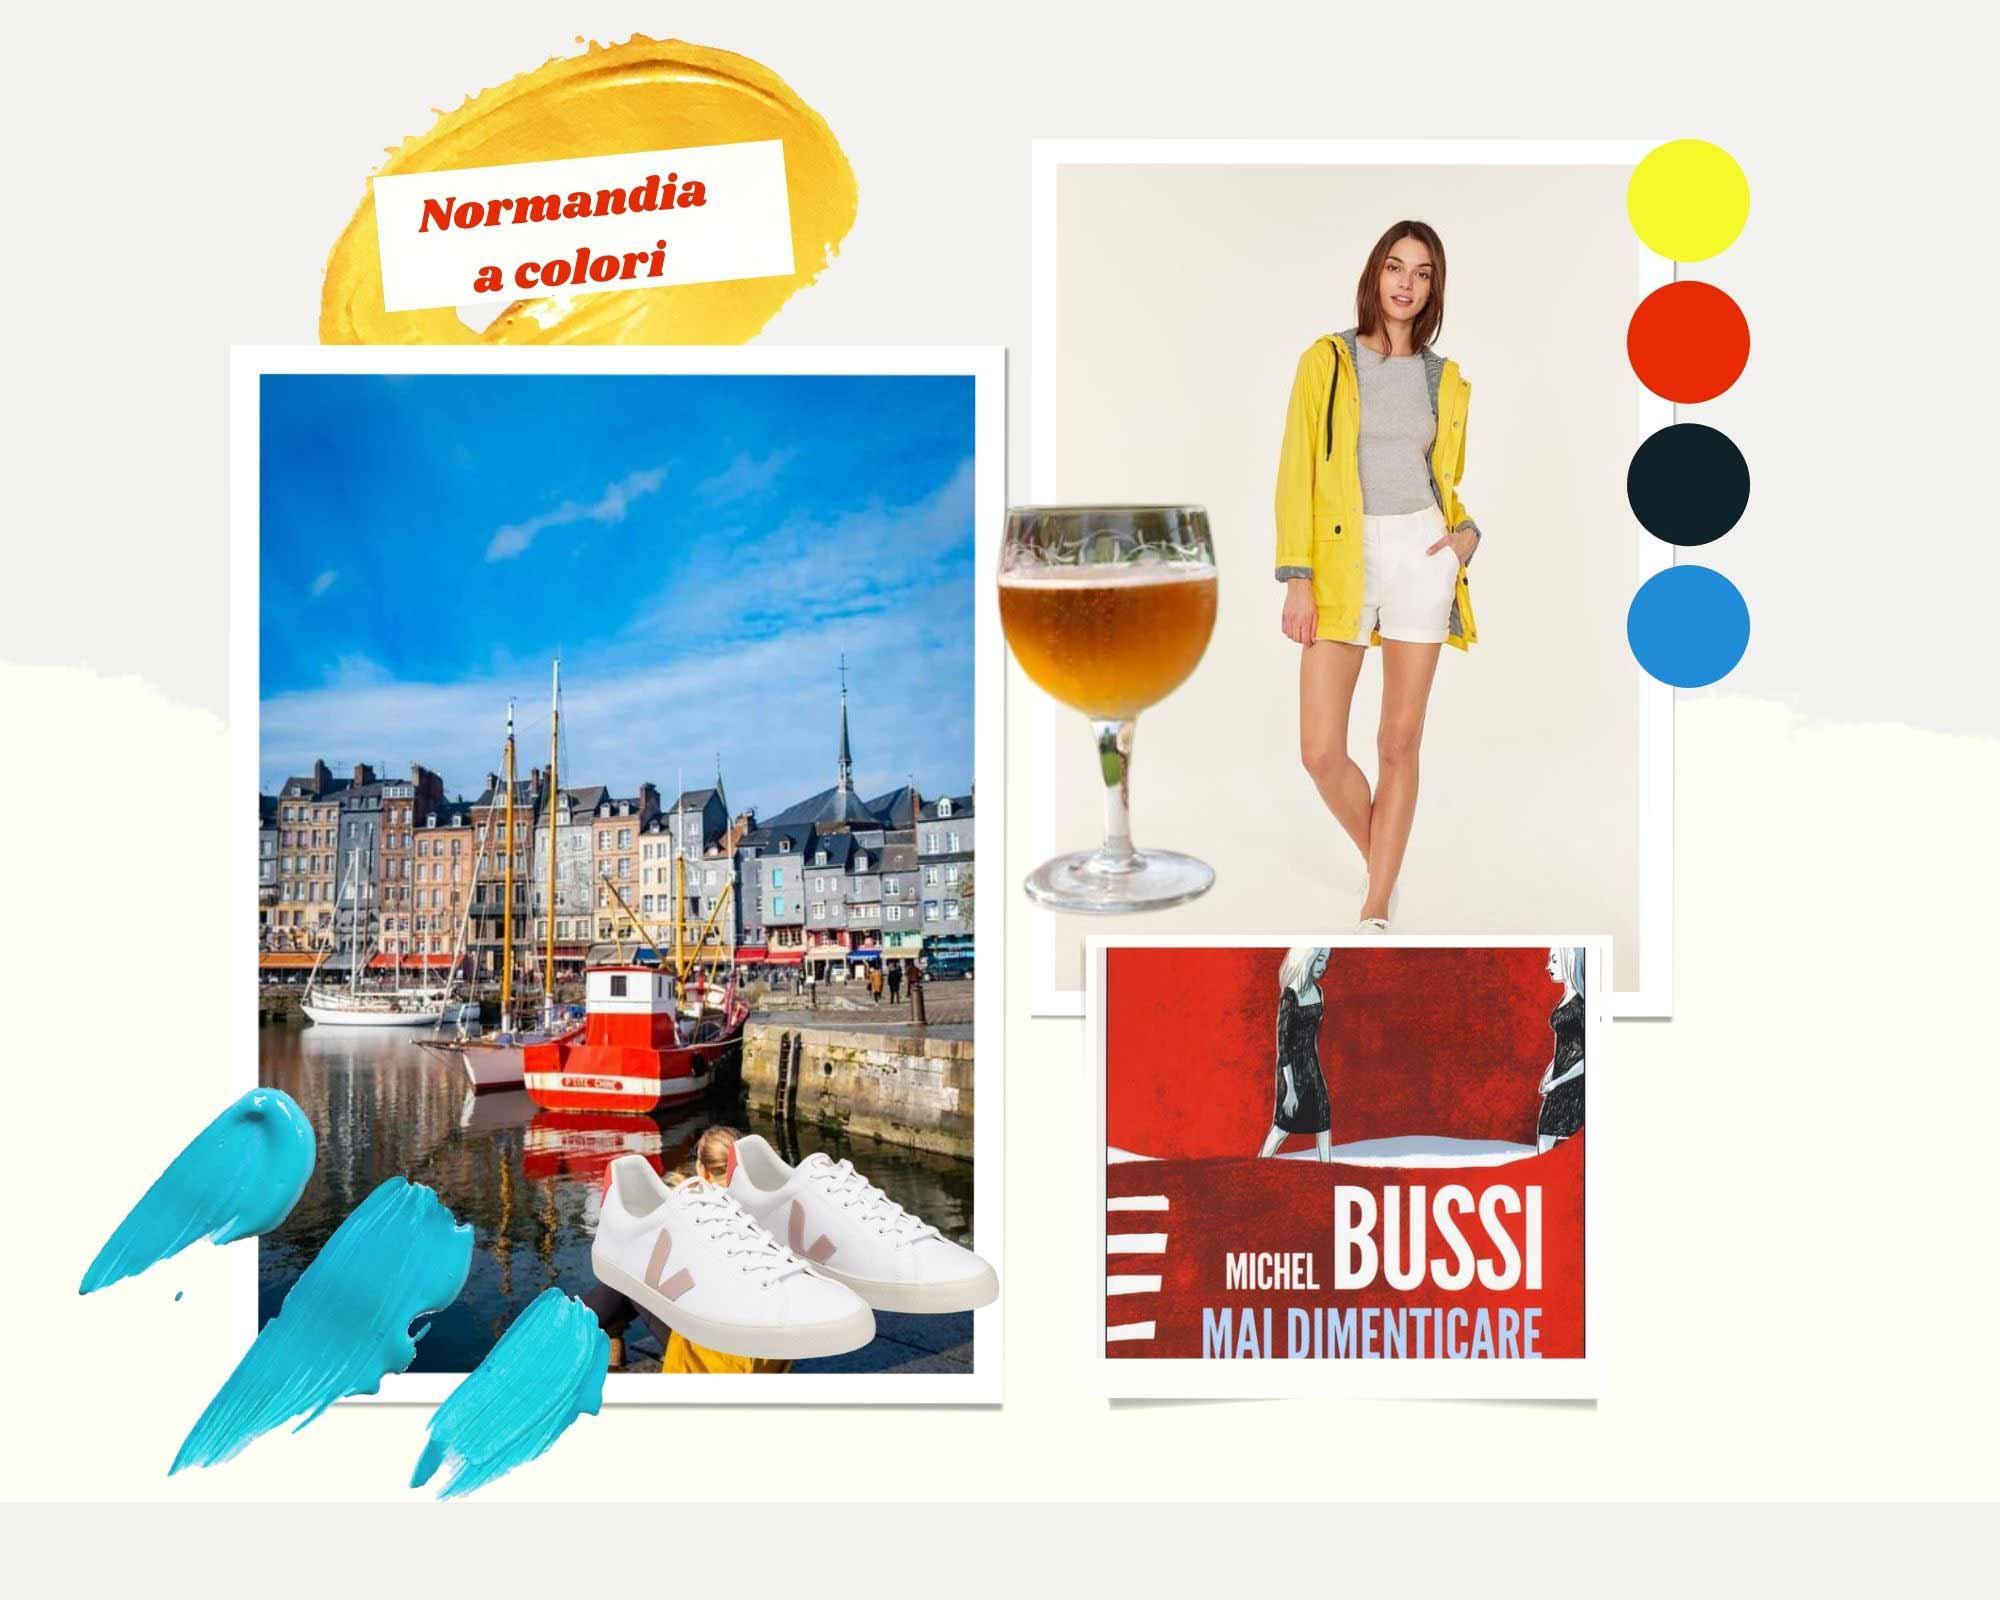 Moodboard Normandia a colori by Instant Mood